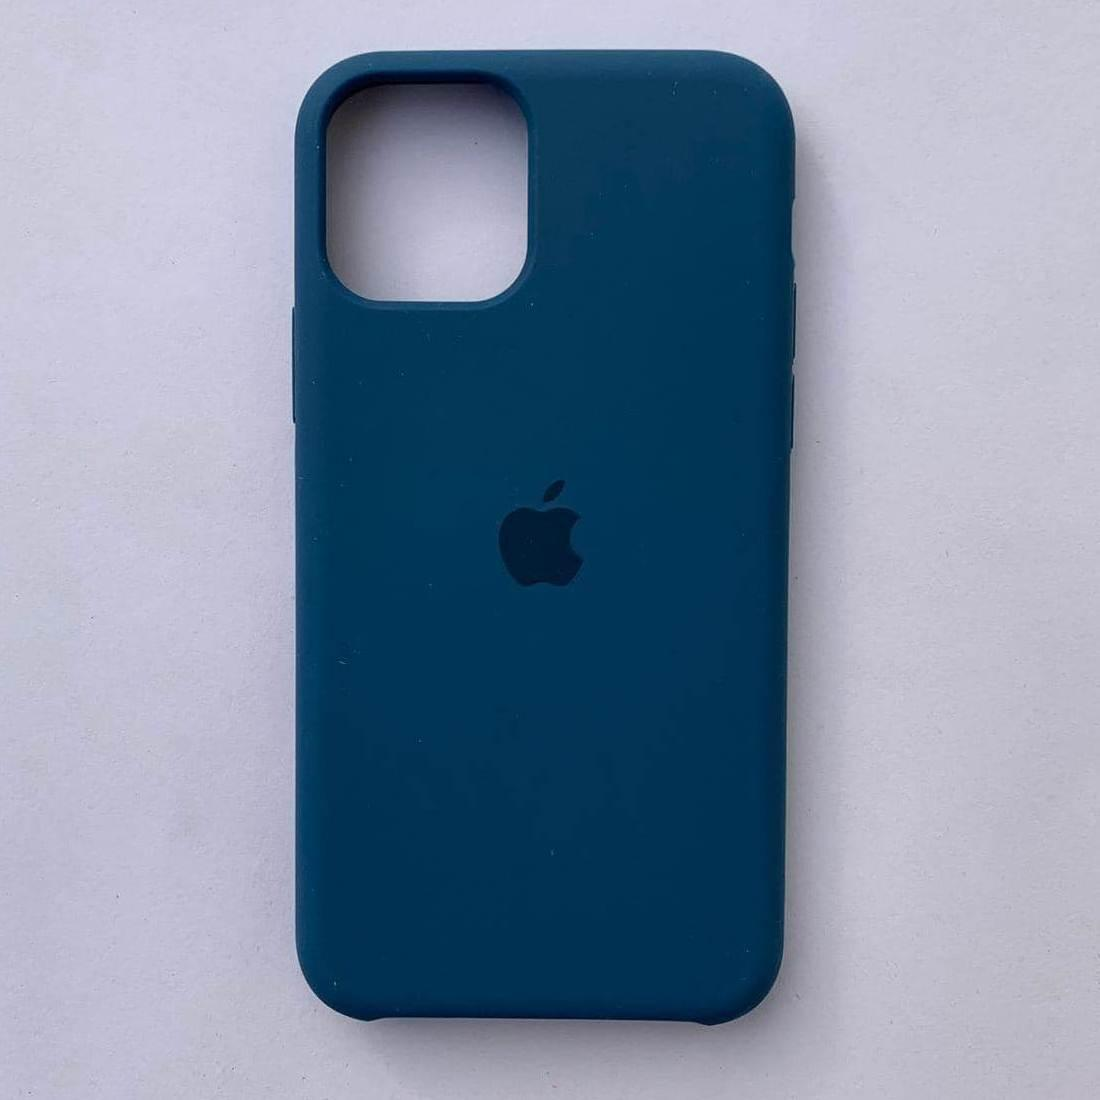 Чехол-накладка Silicone Case для Apple iPhone 11 Pro Max Ocean Blue